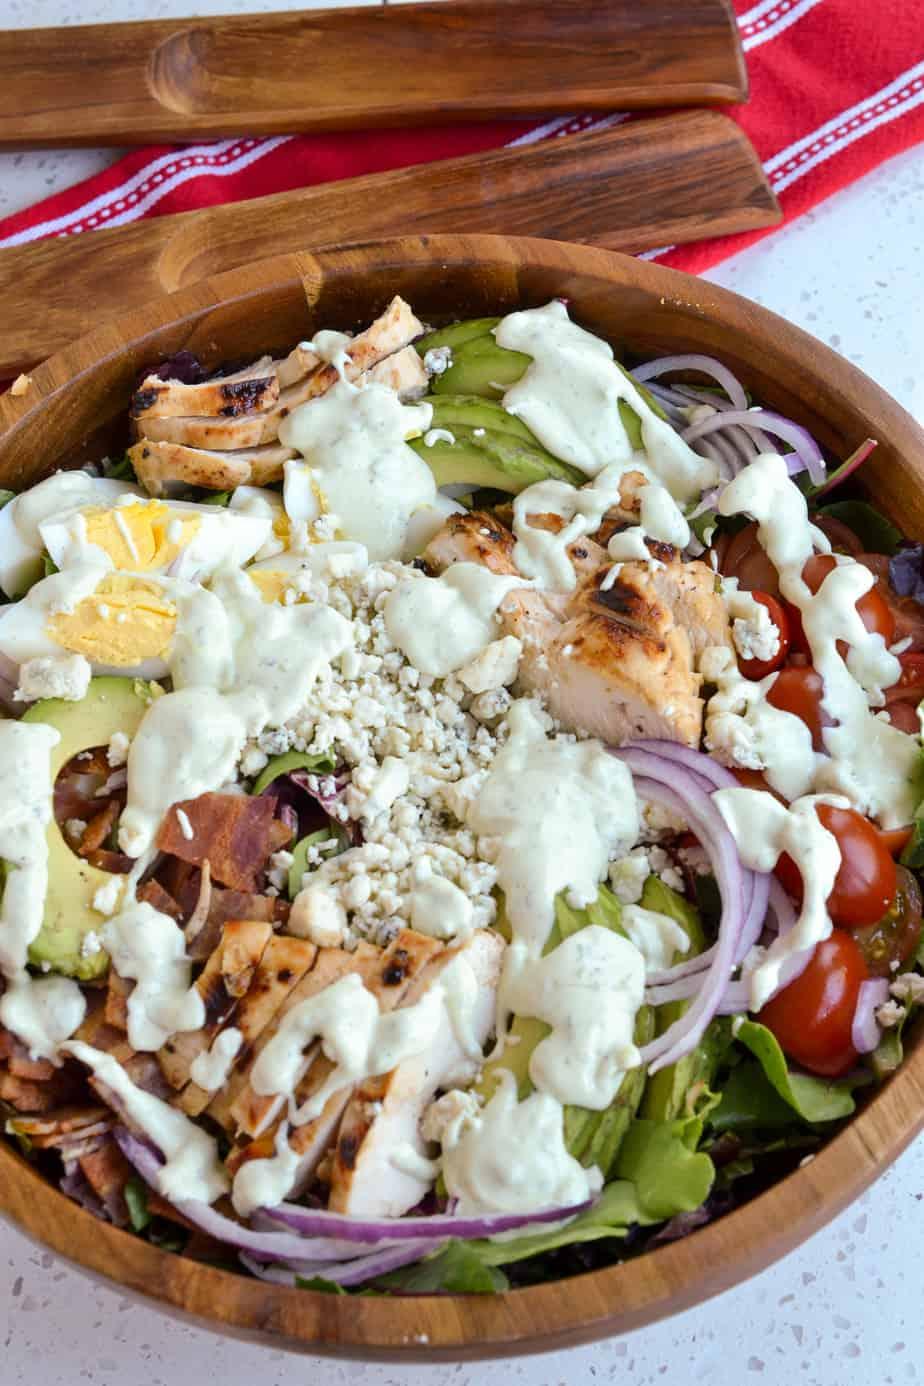 Cobb Salad with homemade avocado ranch dressing